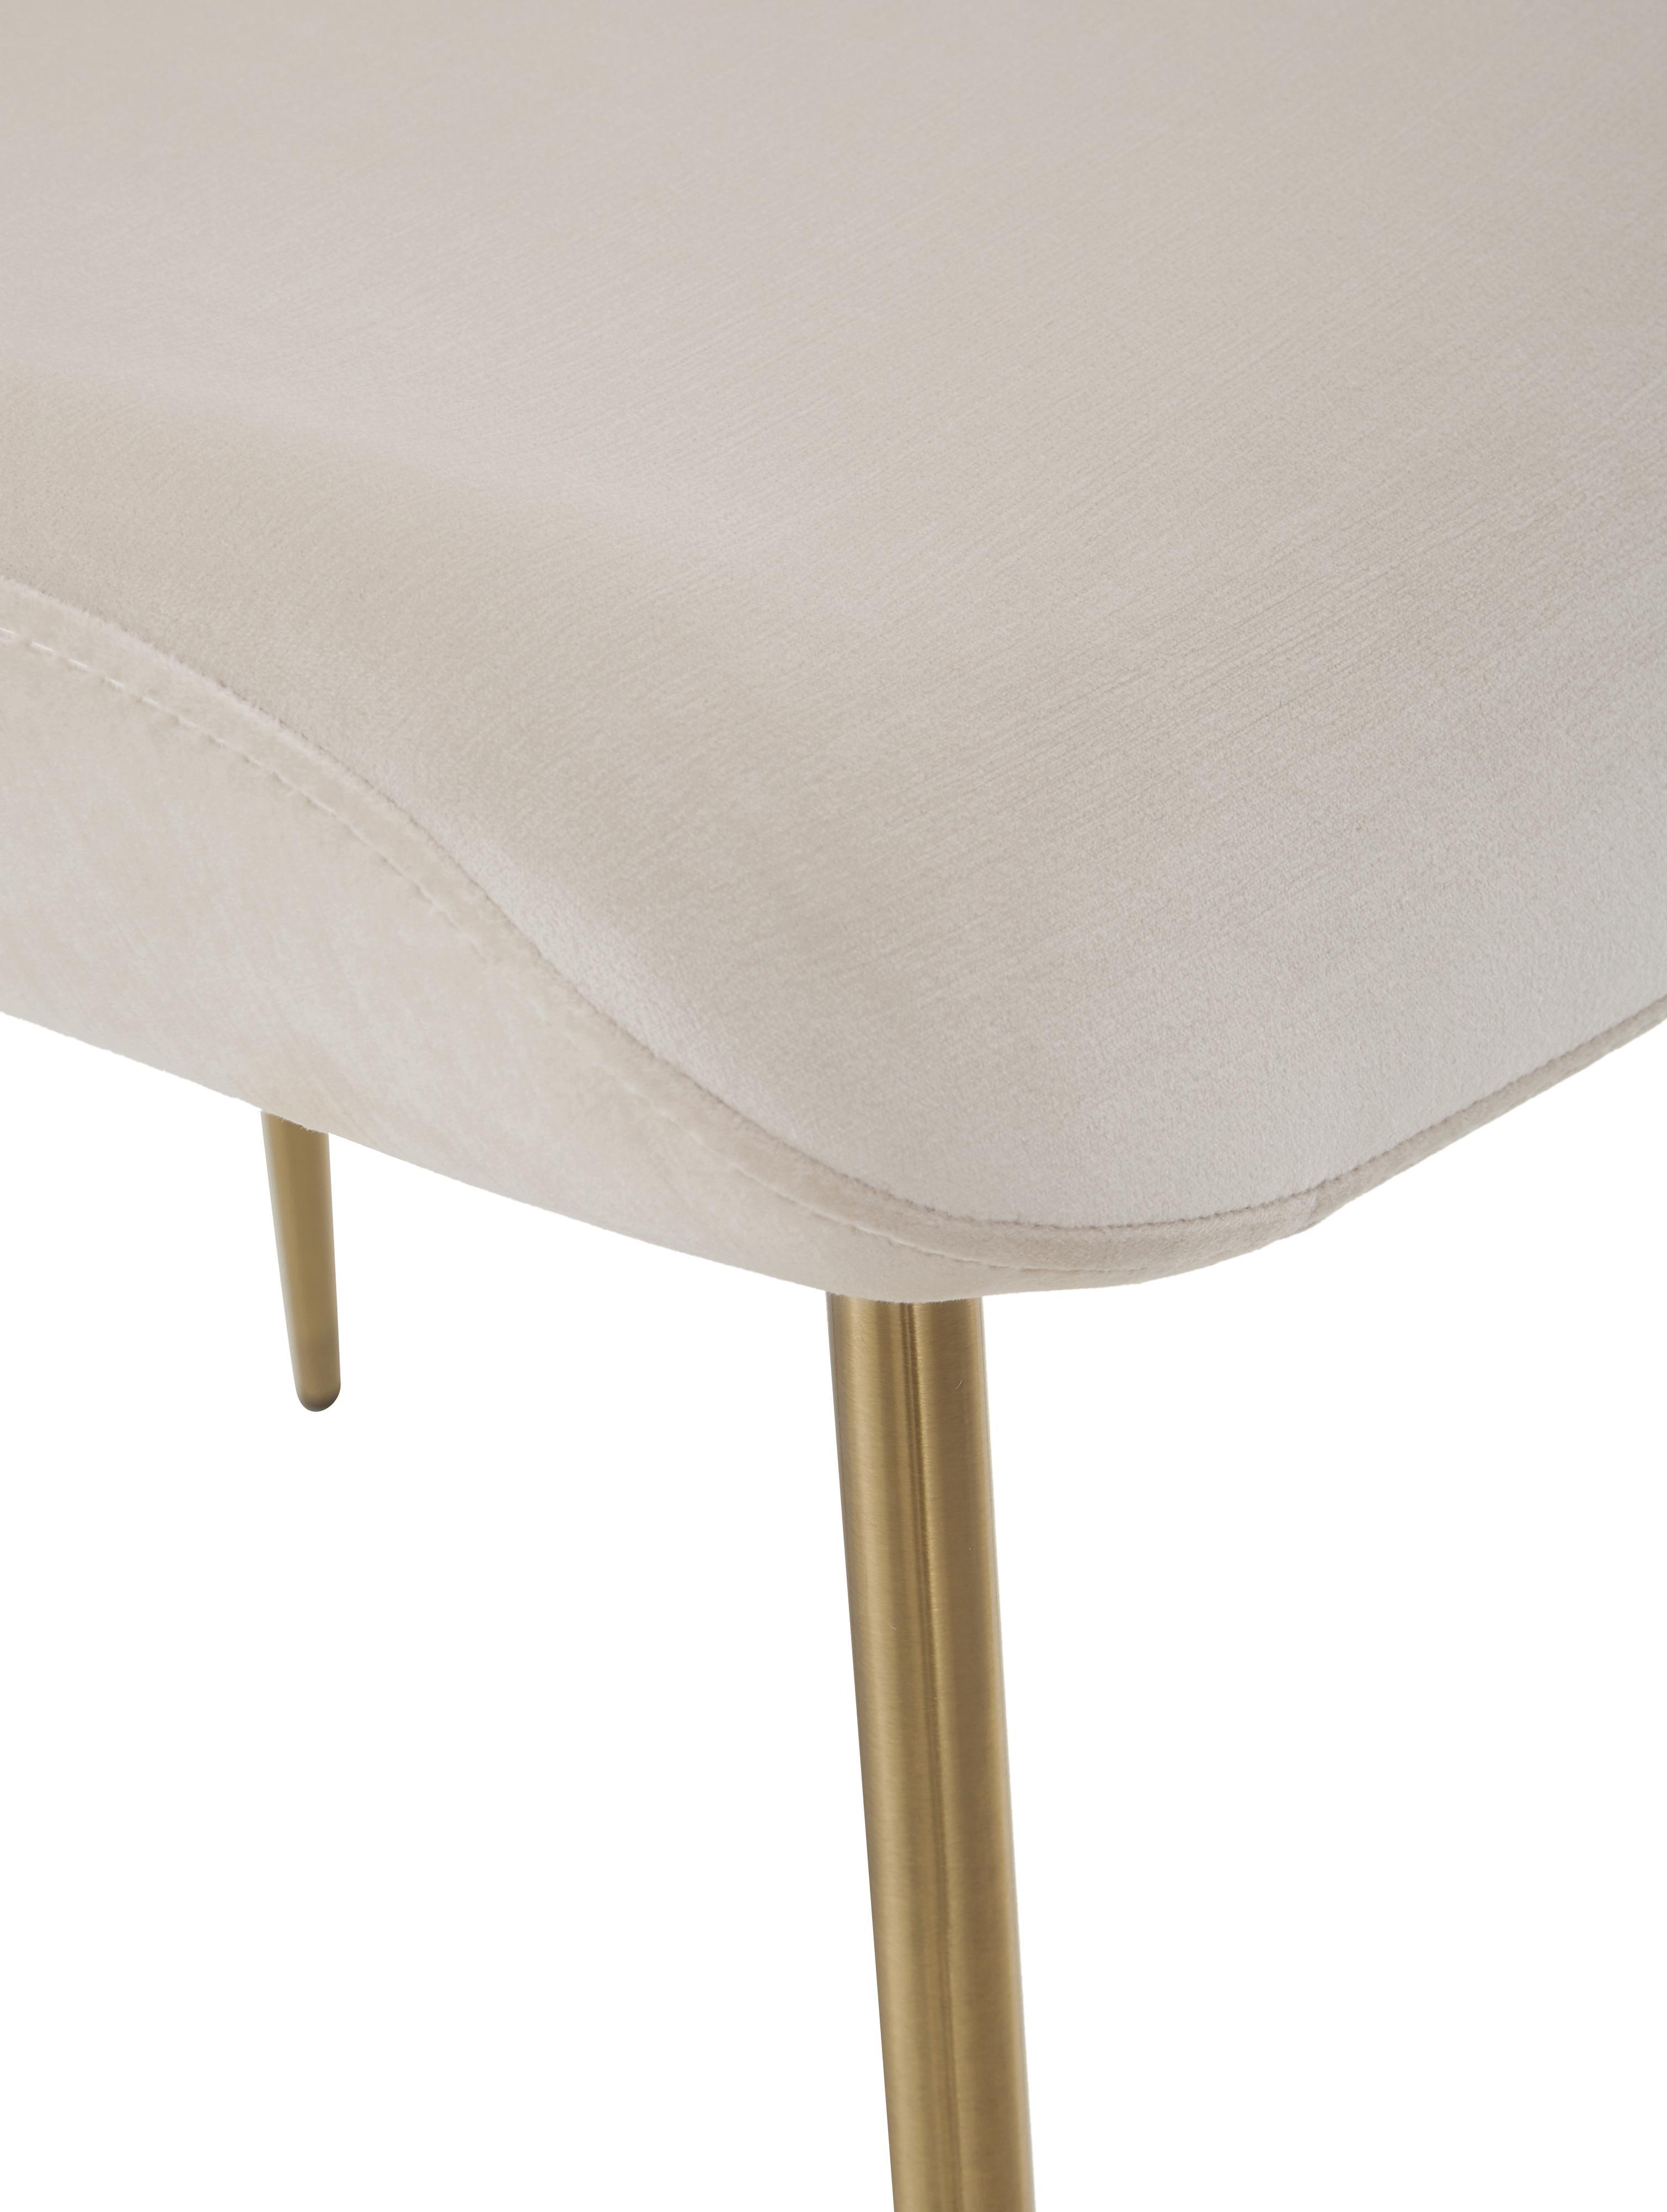 Chaise velours rembourré Tess, Velours beige, pieds or